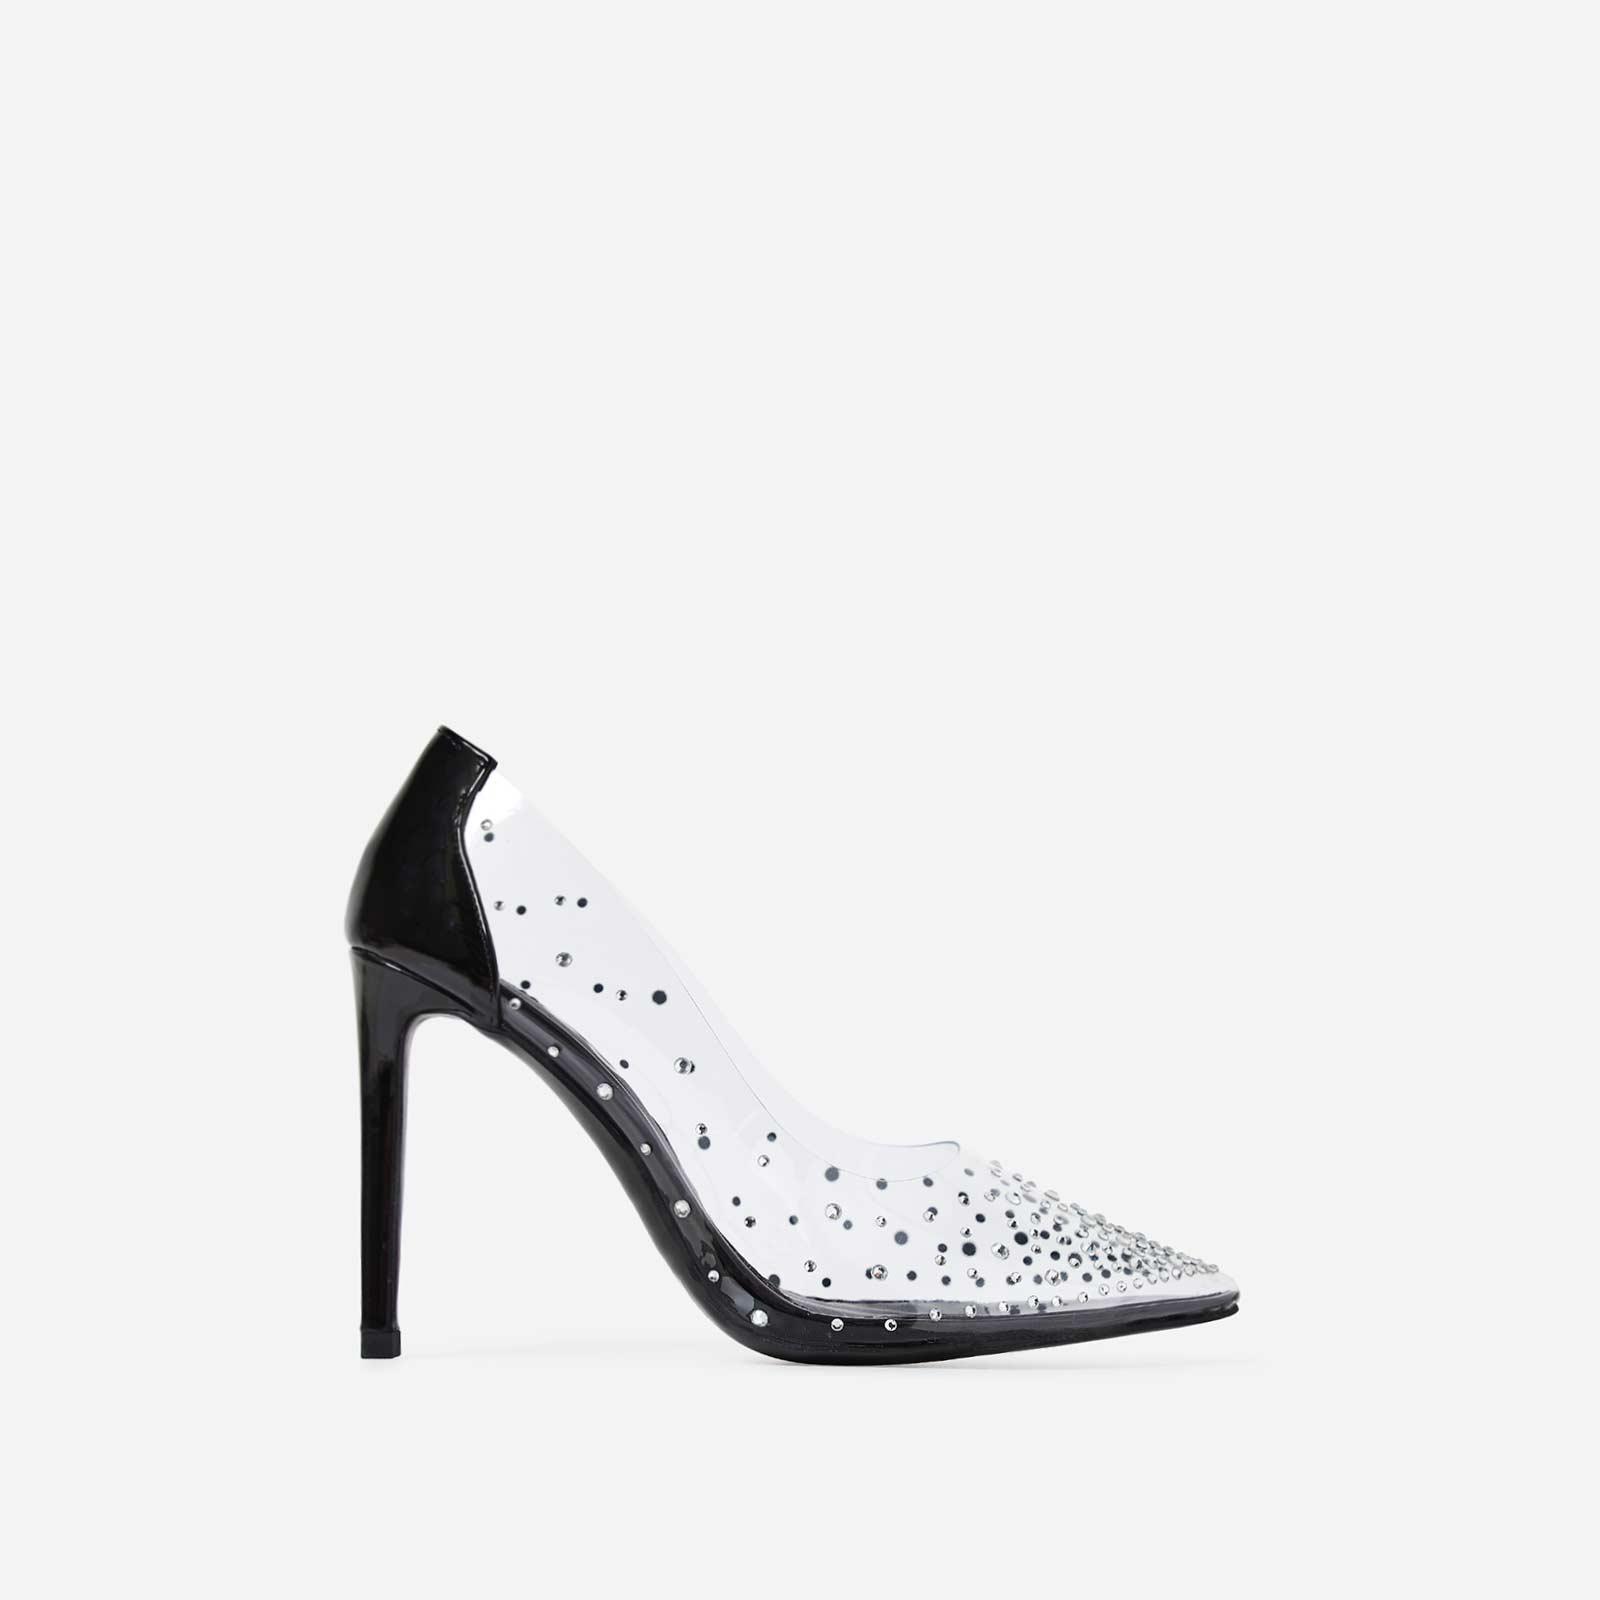 Girls Best Friend Diamante Perspex Court Heel In Black Patent